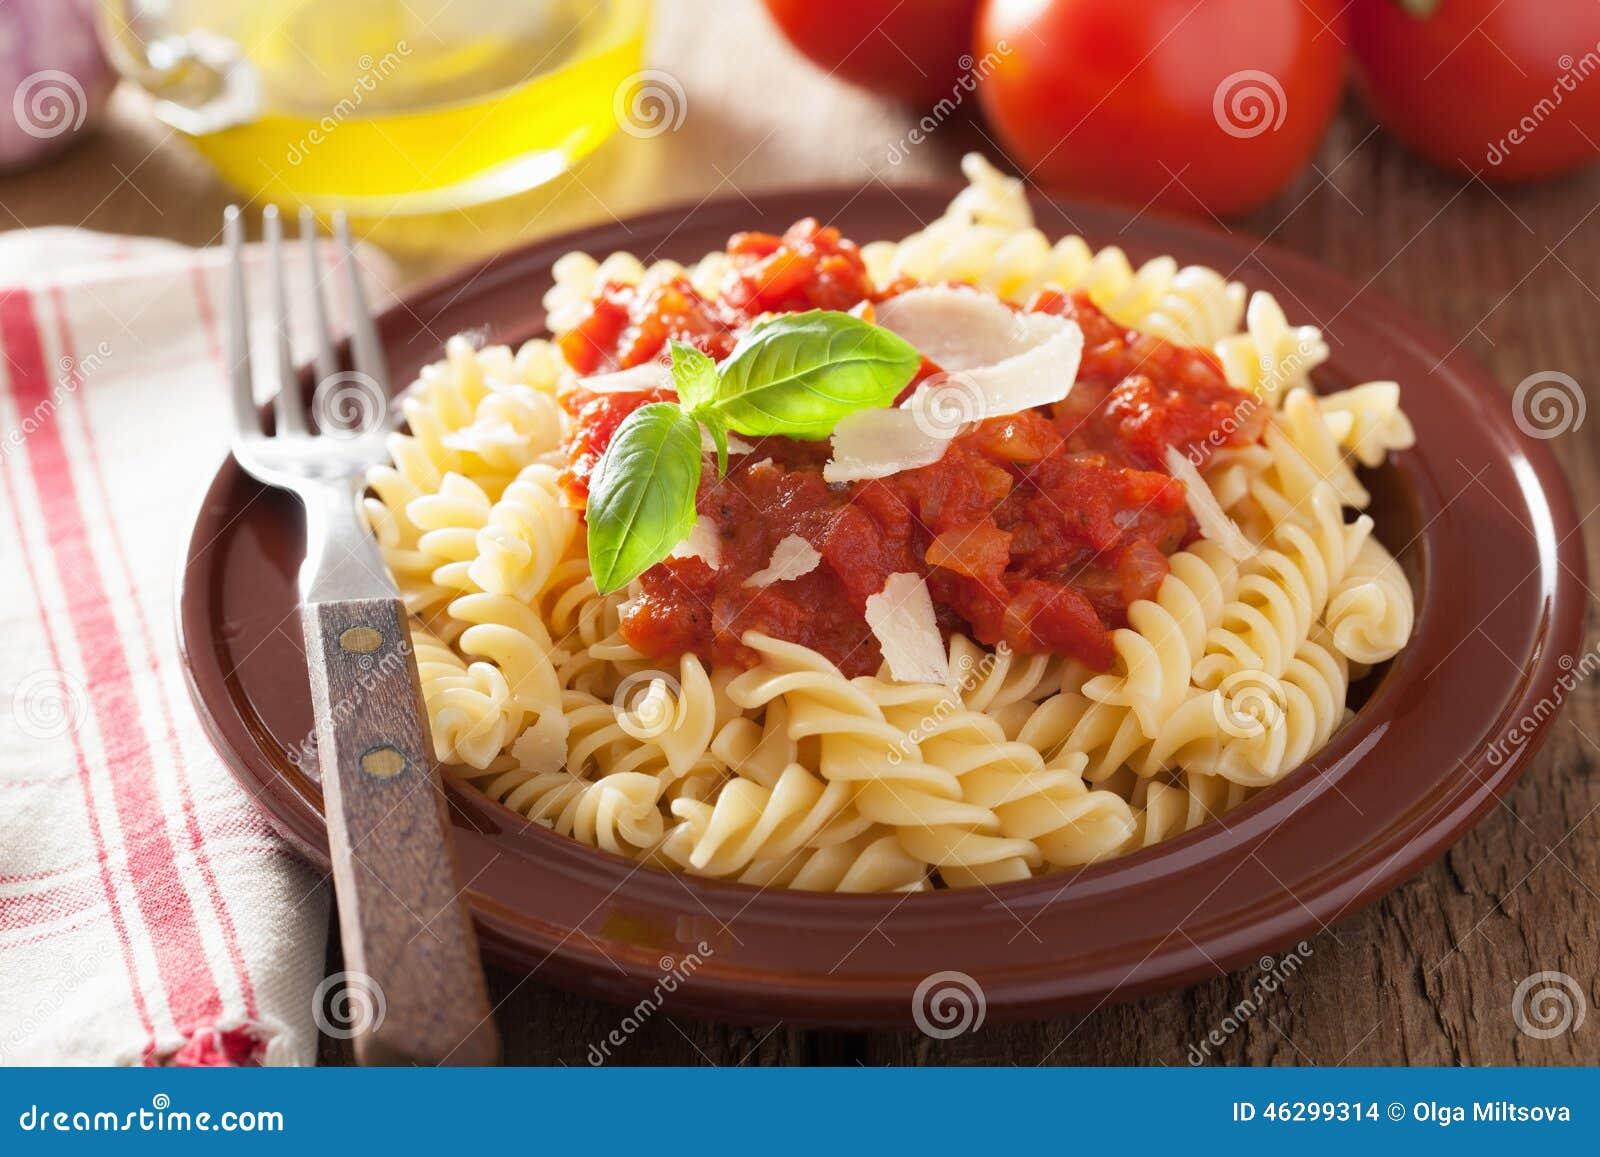 Italian Classic Pasta Fusilli With Tomato Sauce And Basil ...